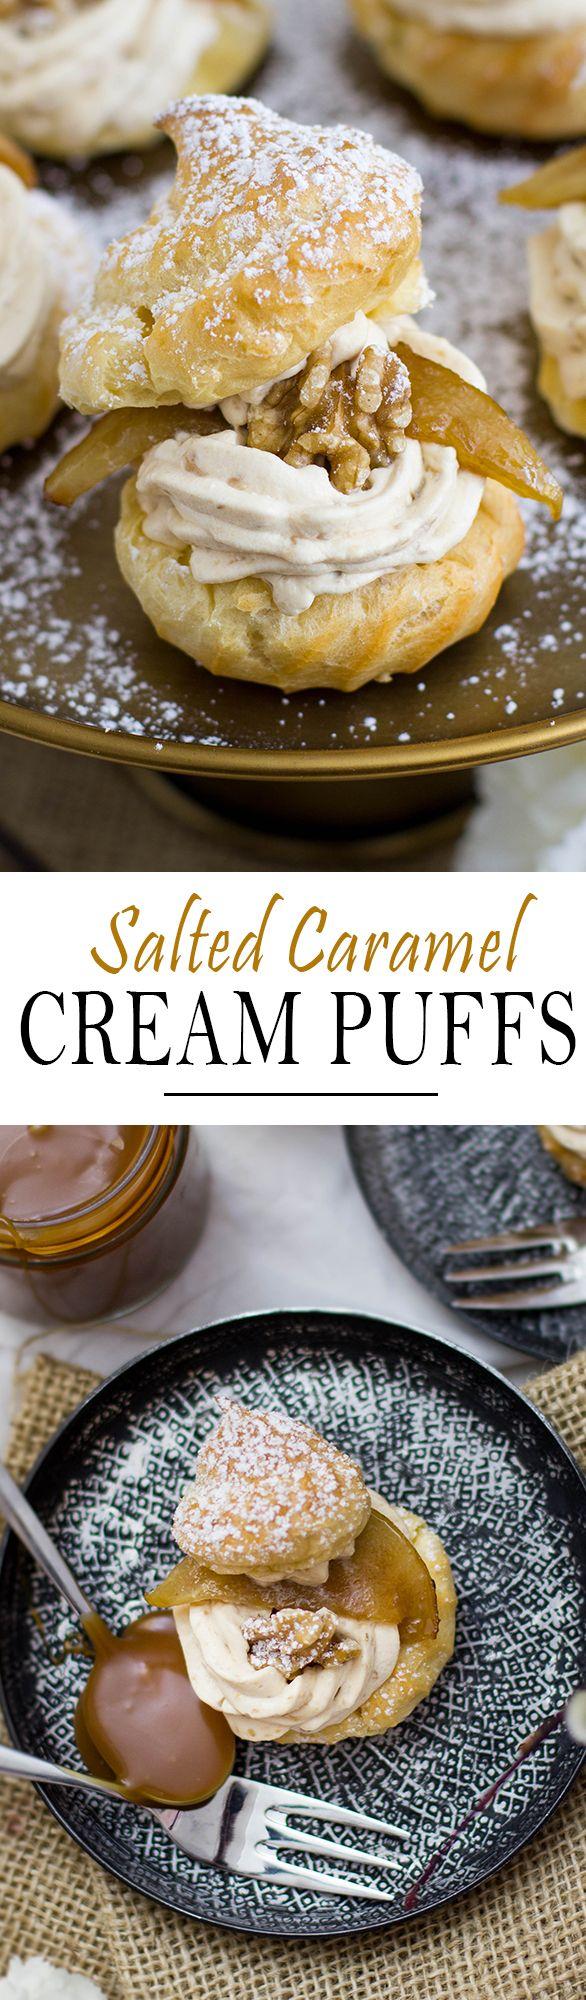 Salted Caramel Cream Puffs with Walnut and caramelized pear   Karamell Birnen Windbeutel mit salzigem Karamell, Wallnuss und karamellisierten Birnen